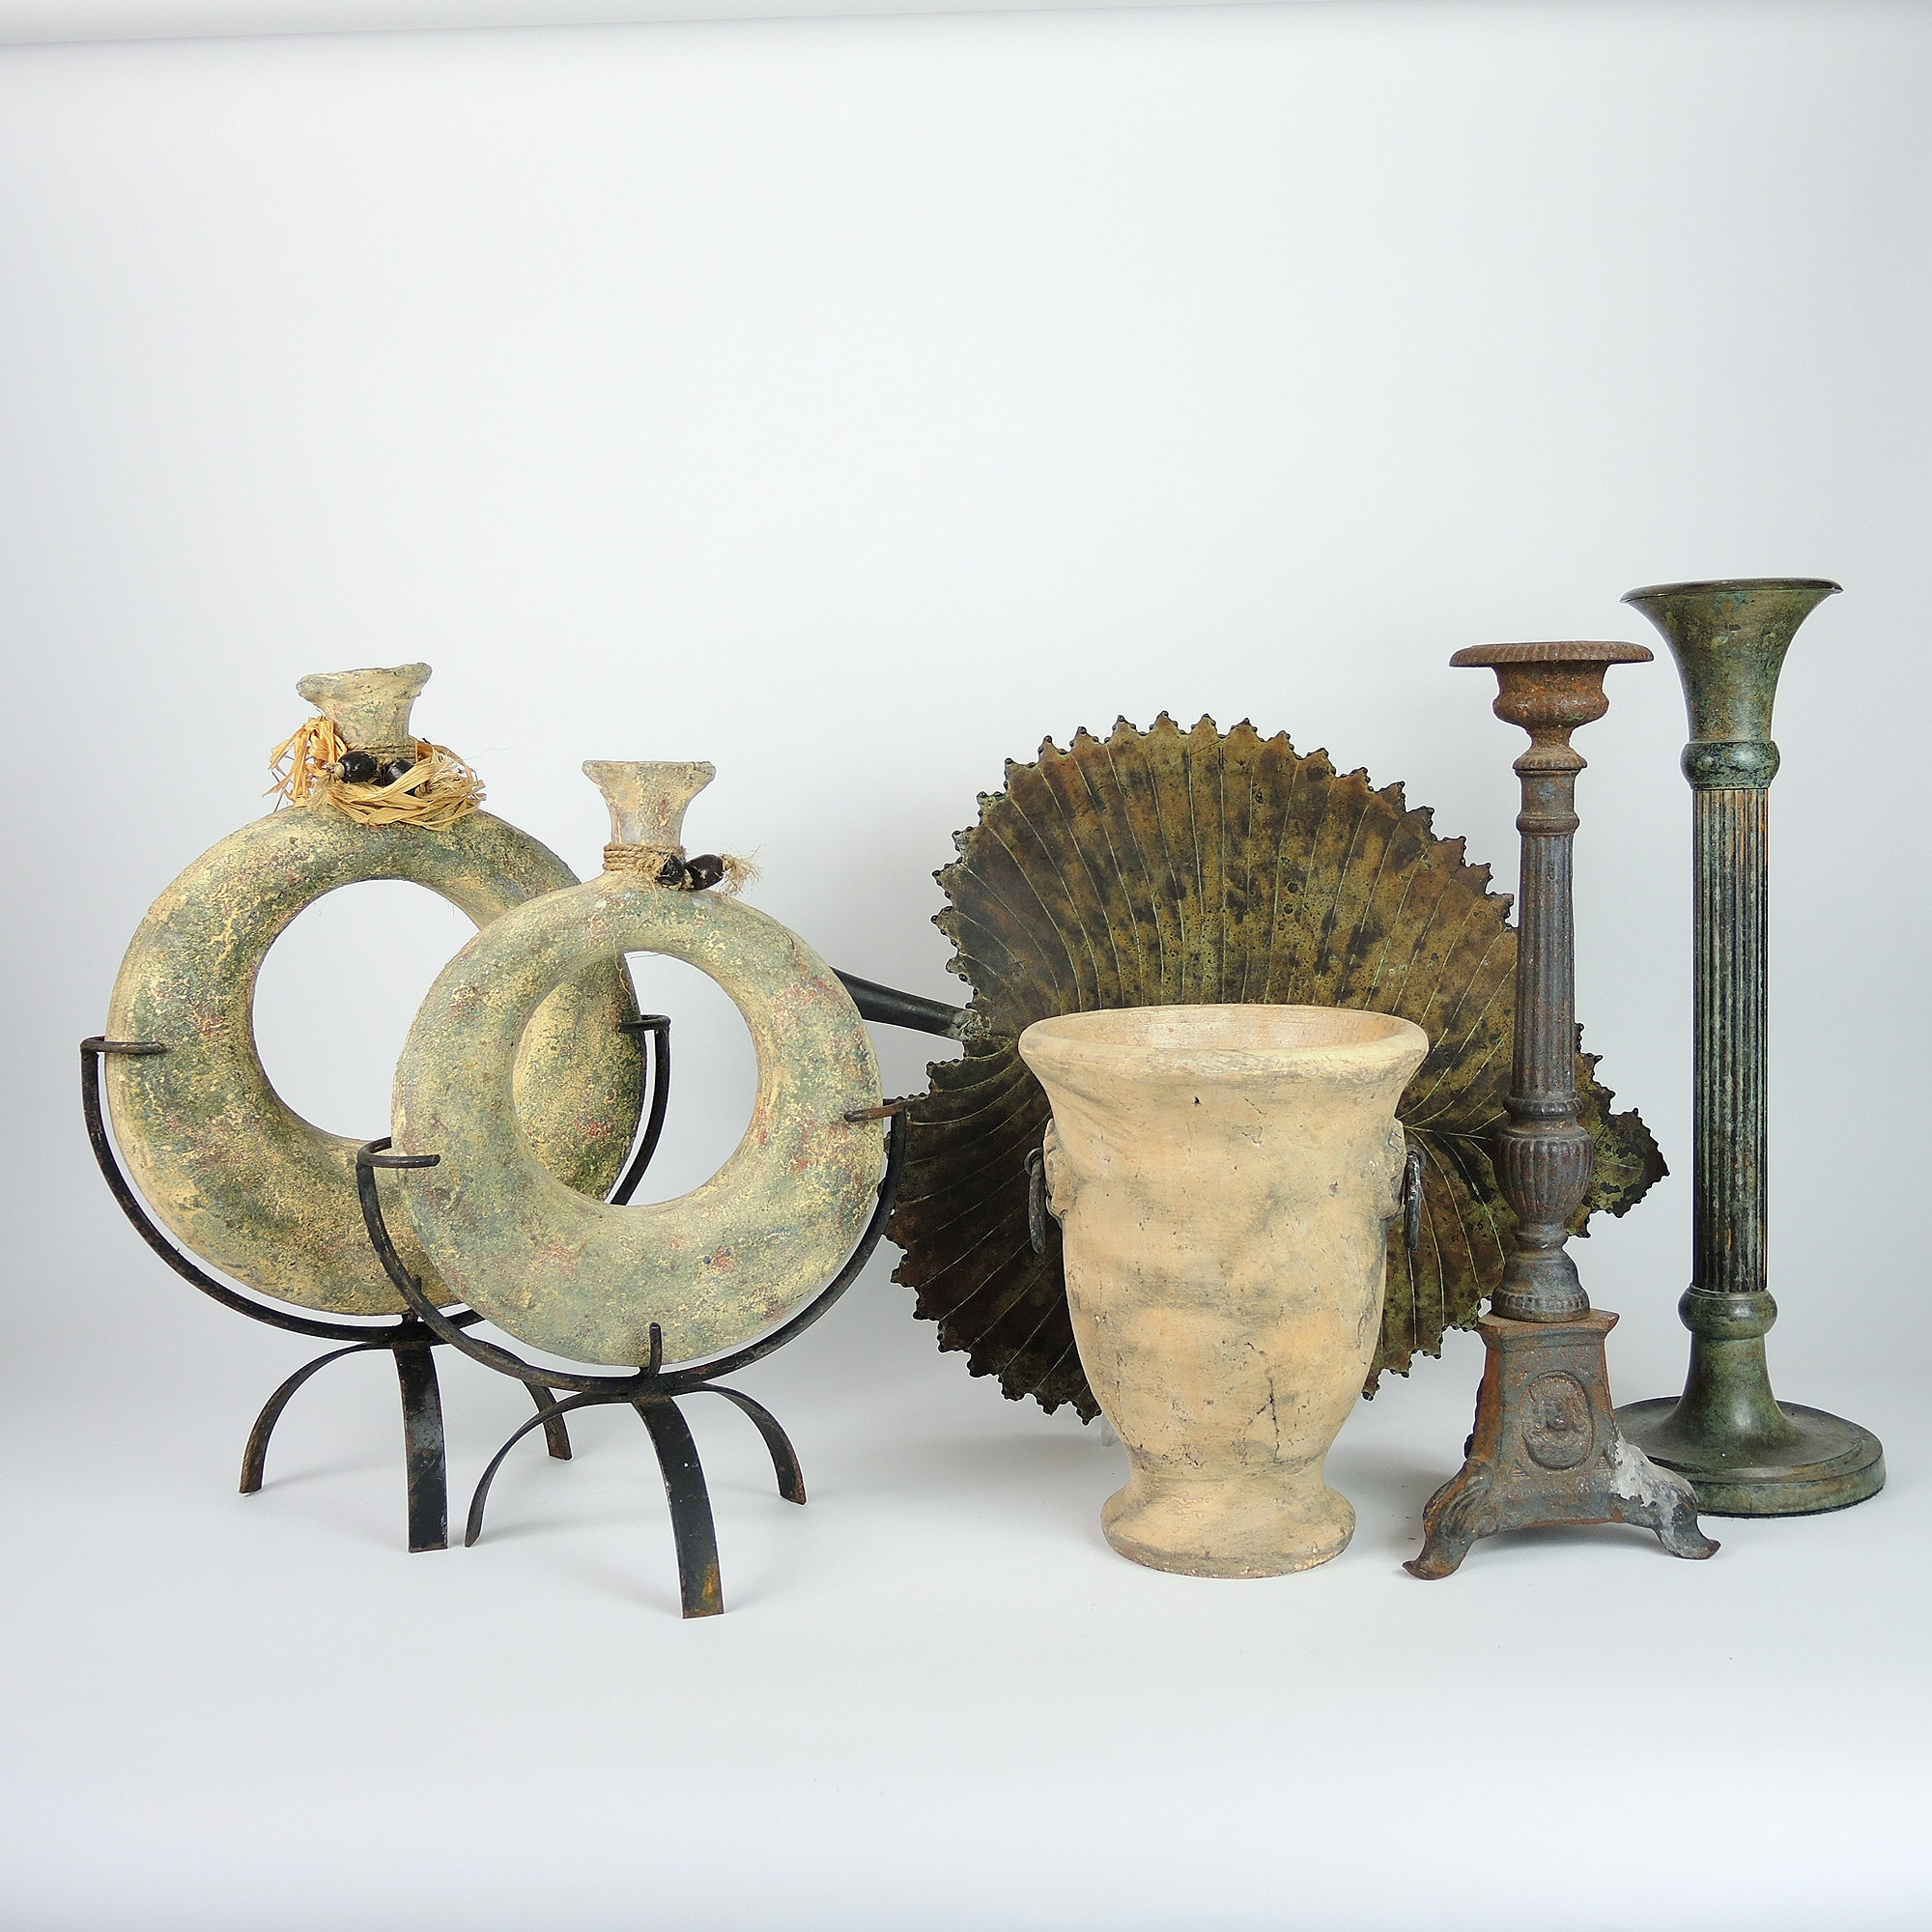 Handmade Stoneware Featuring Greek Vases